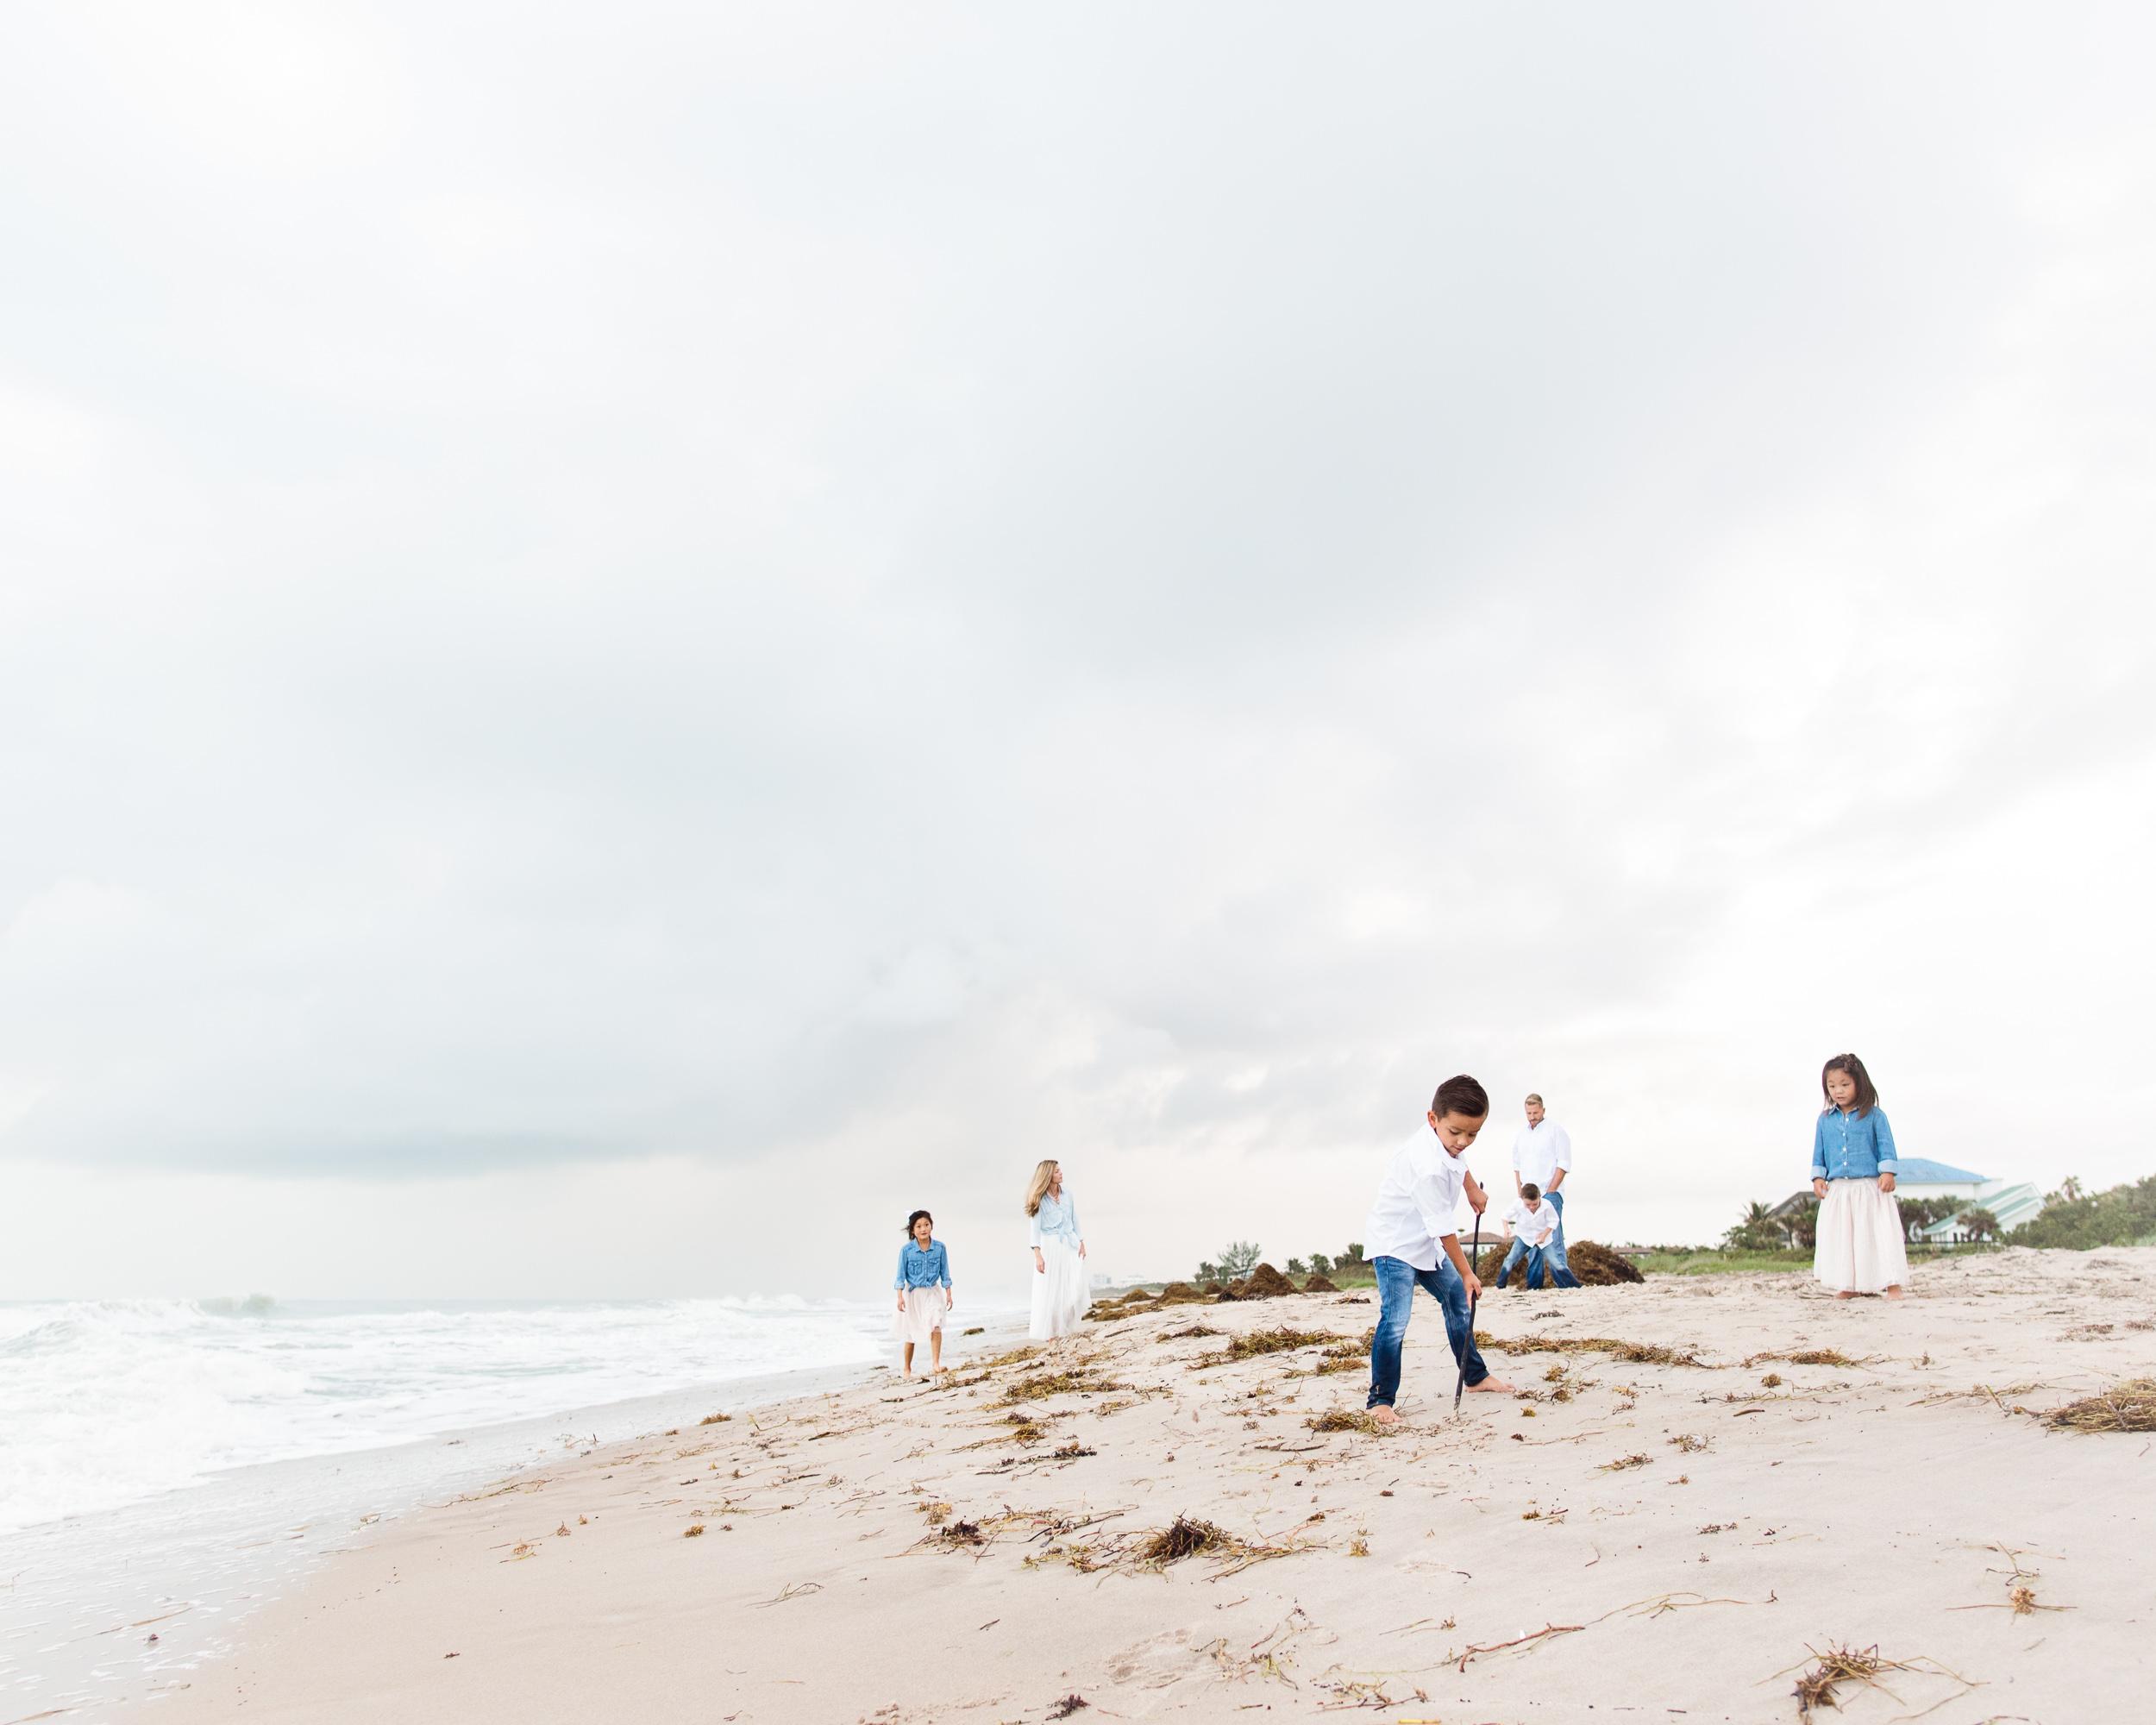 vero-beach-family-photographer-beach-session06.jpg